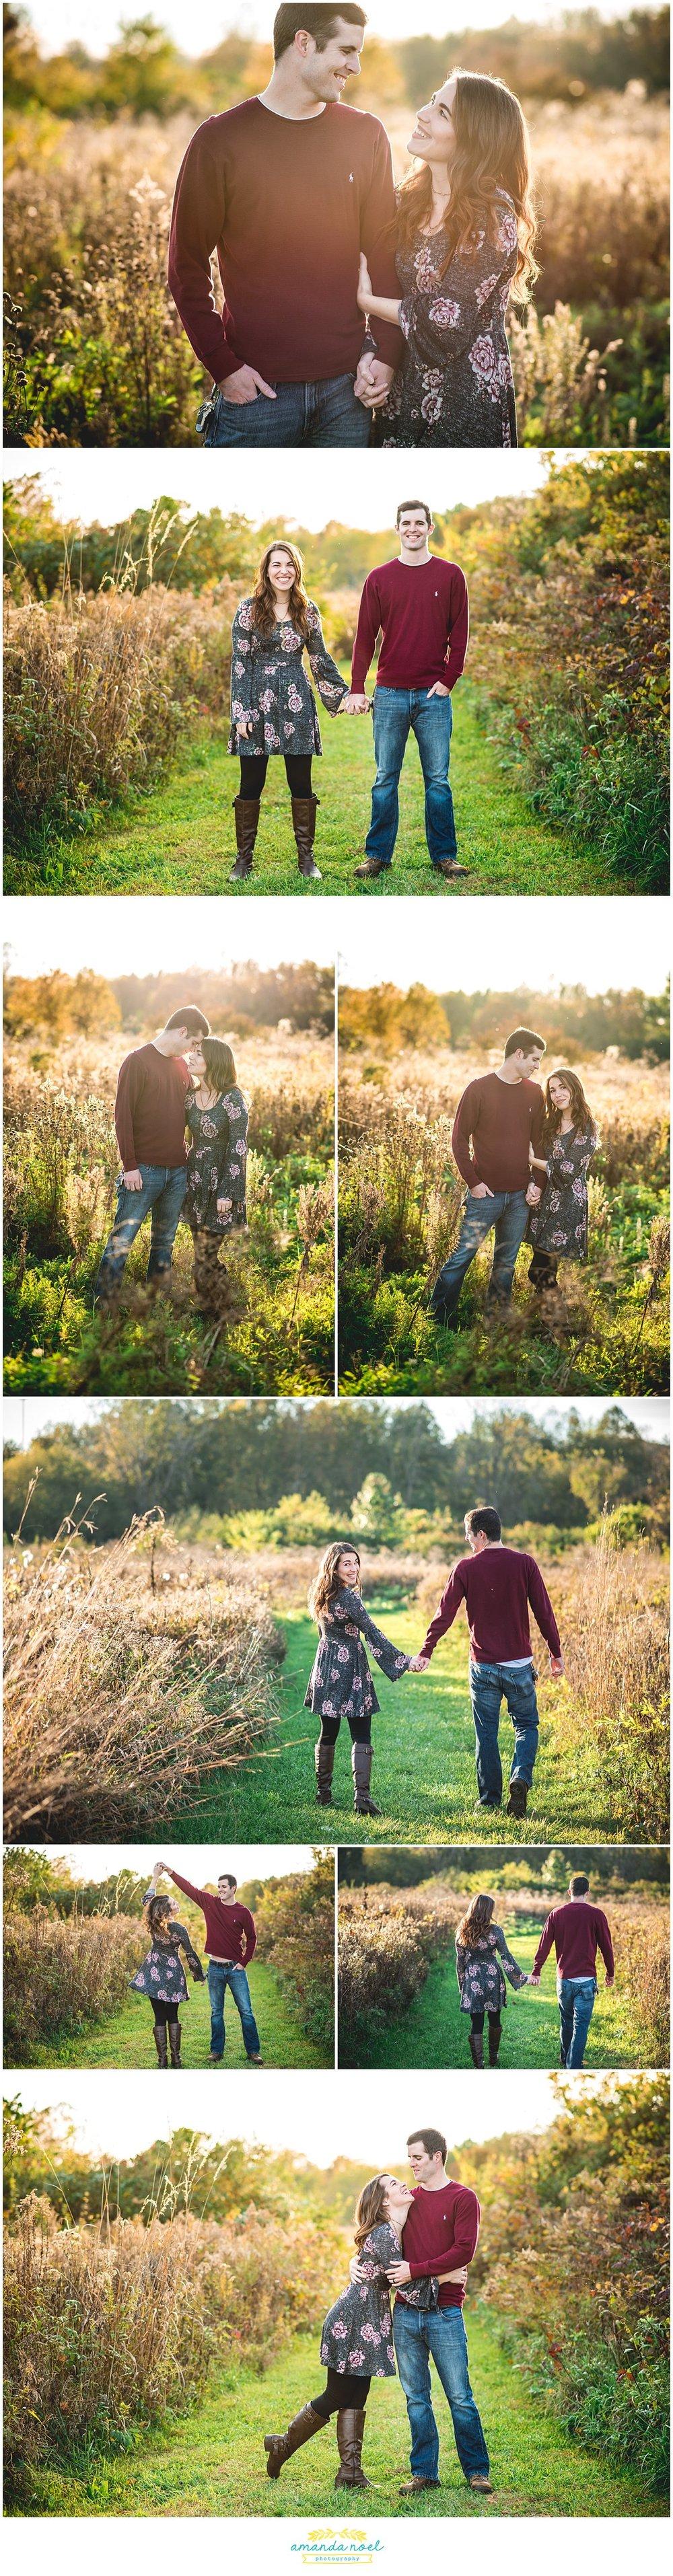 Columbus-Ohio-couple-photographer-fun-session-in-a-field